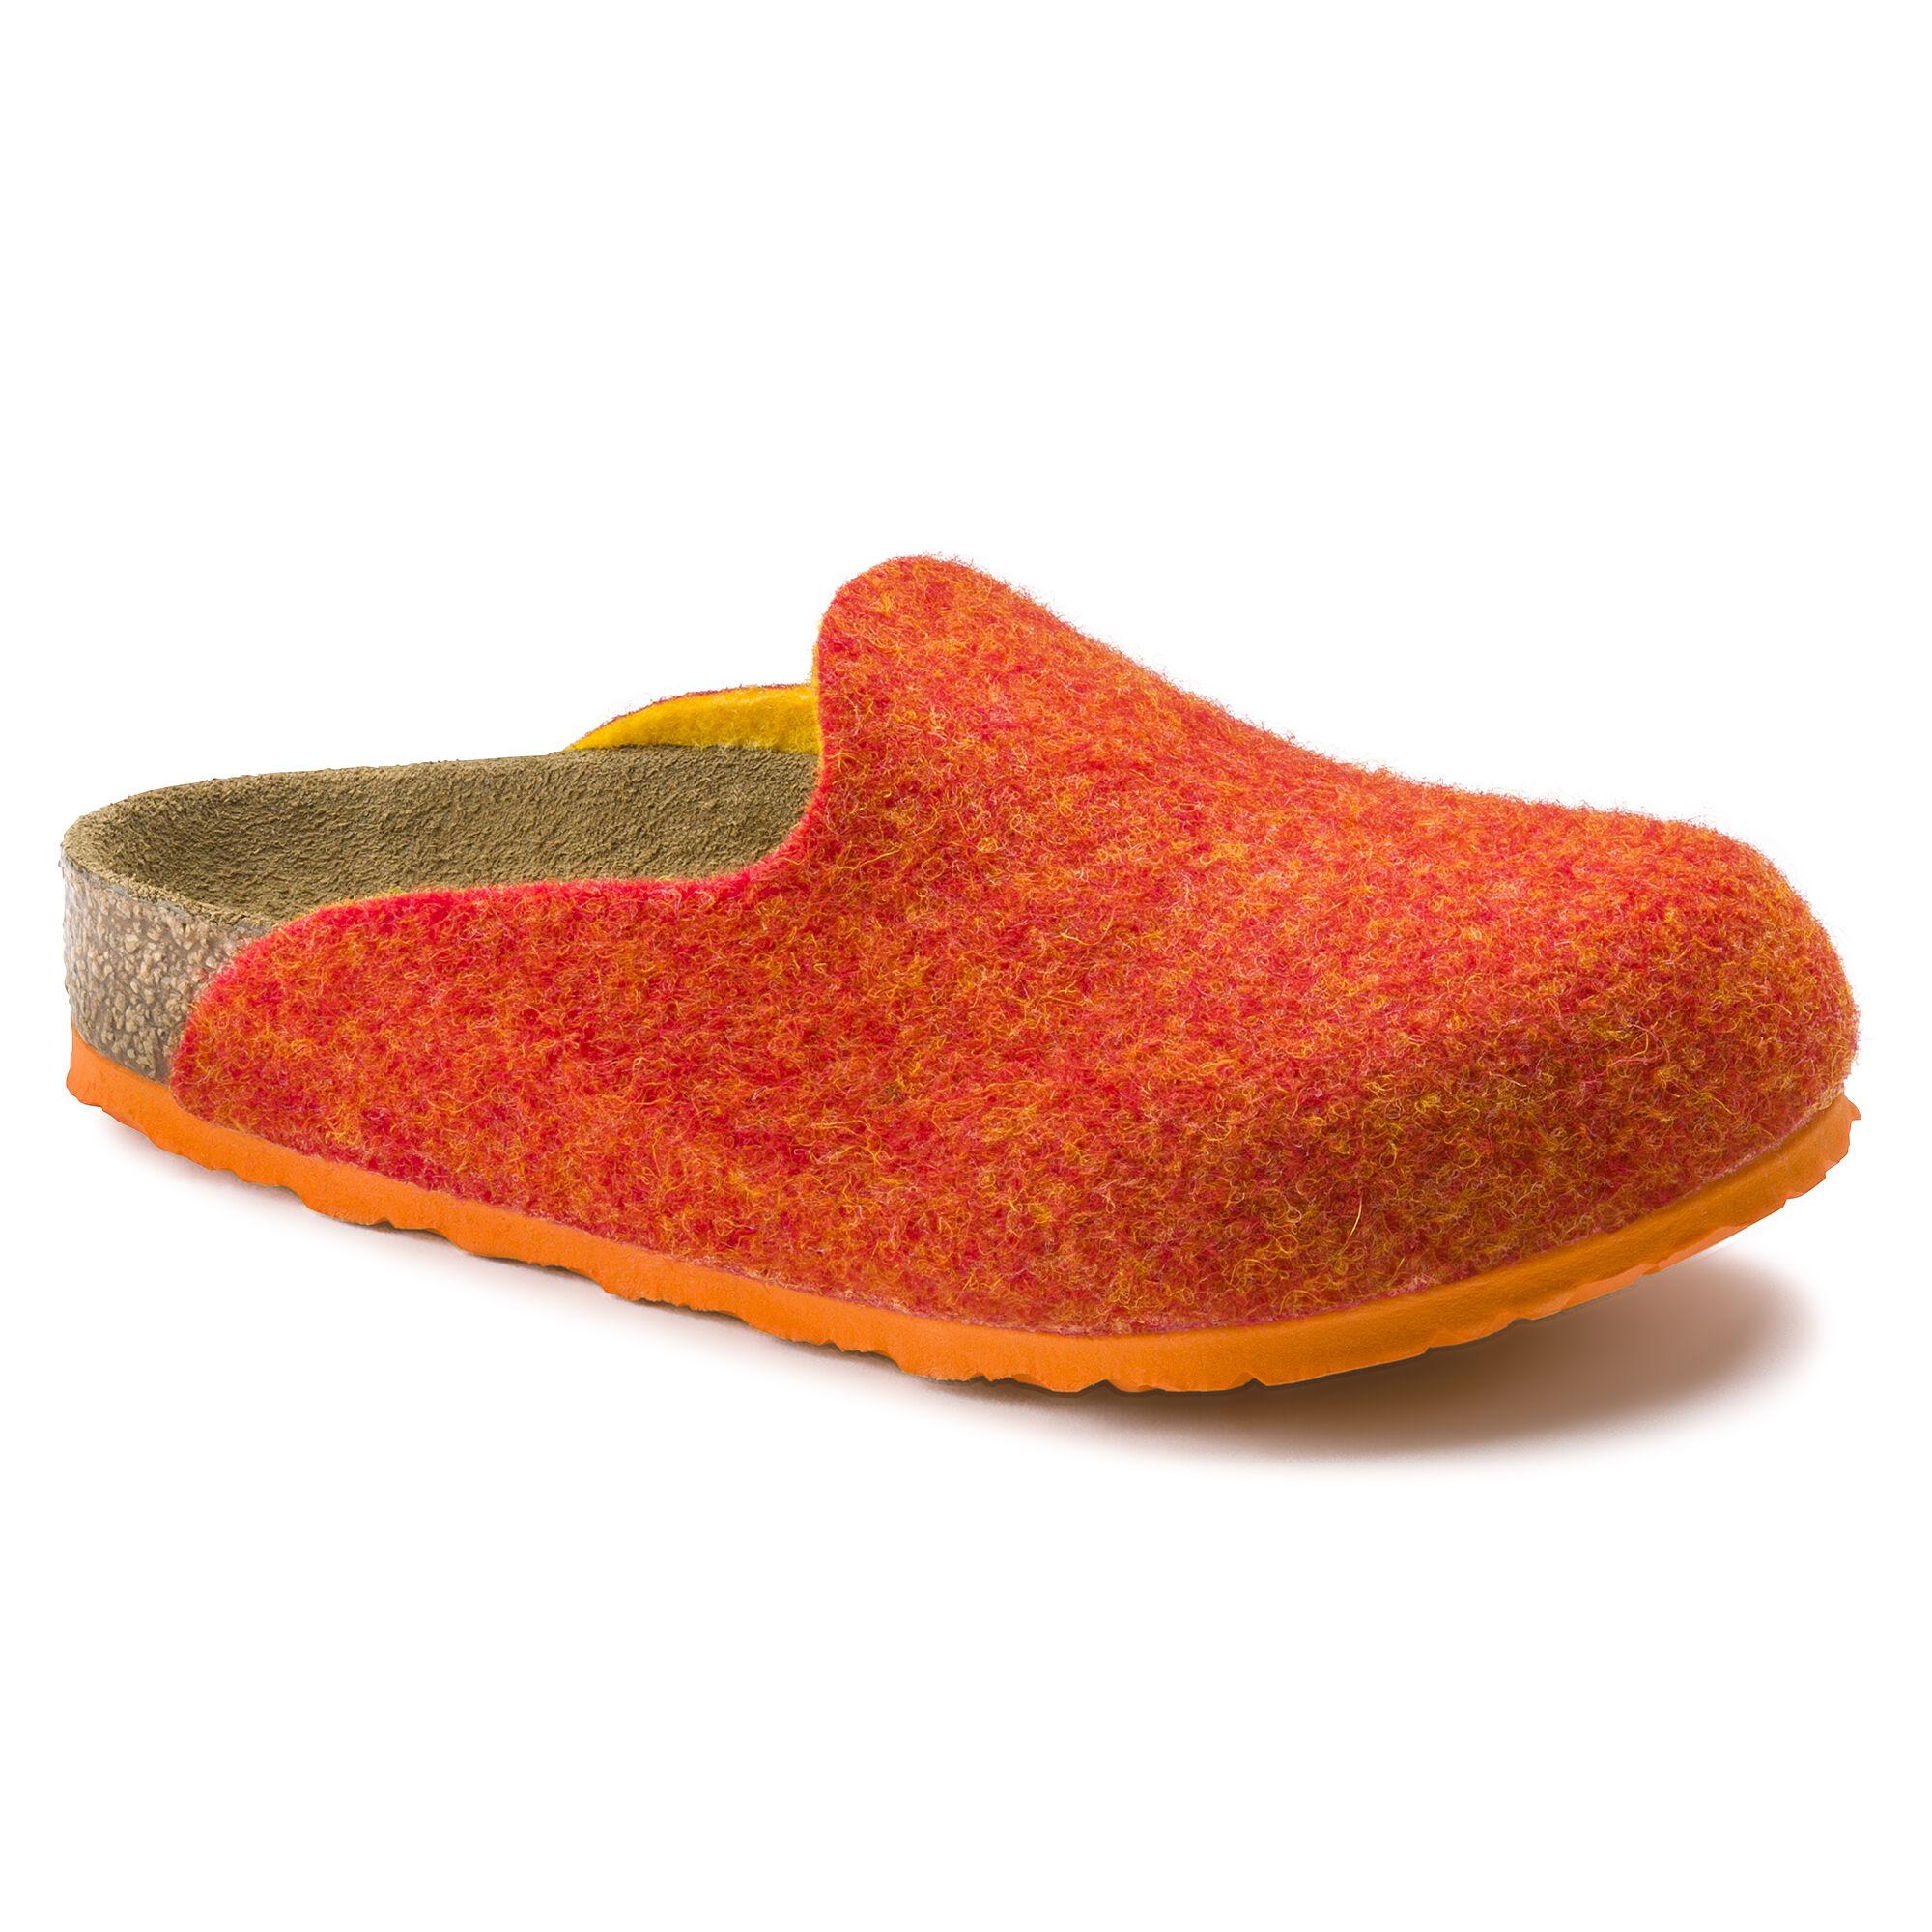 Kids Shoes and Sandals   online kaufen bei BIRKENSTOCK